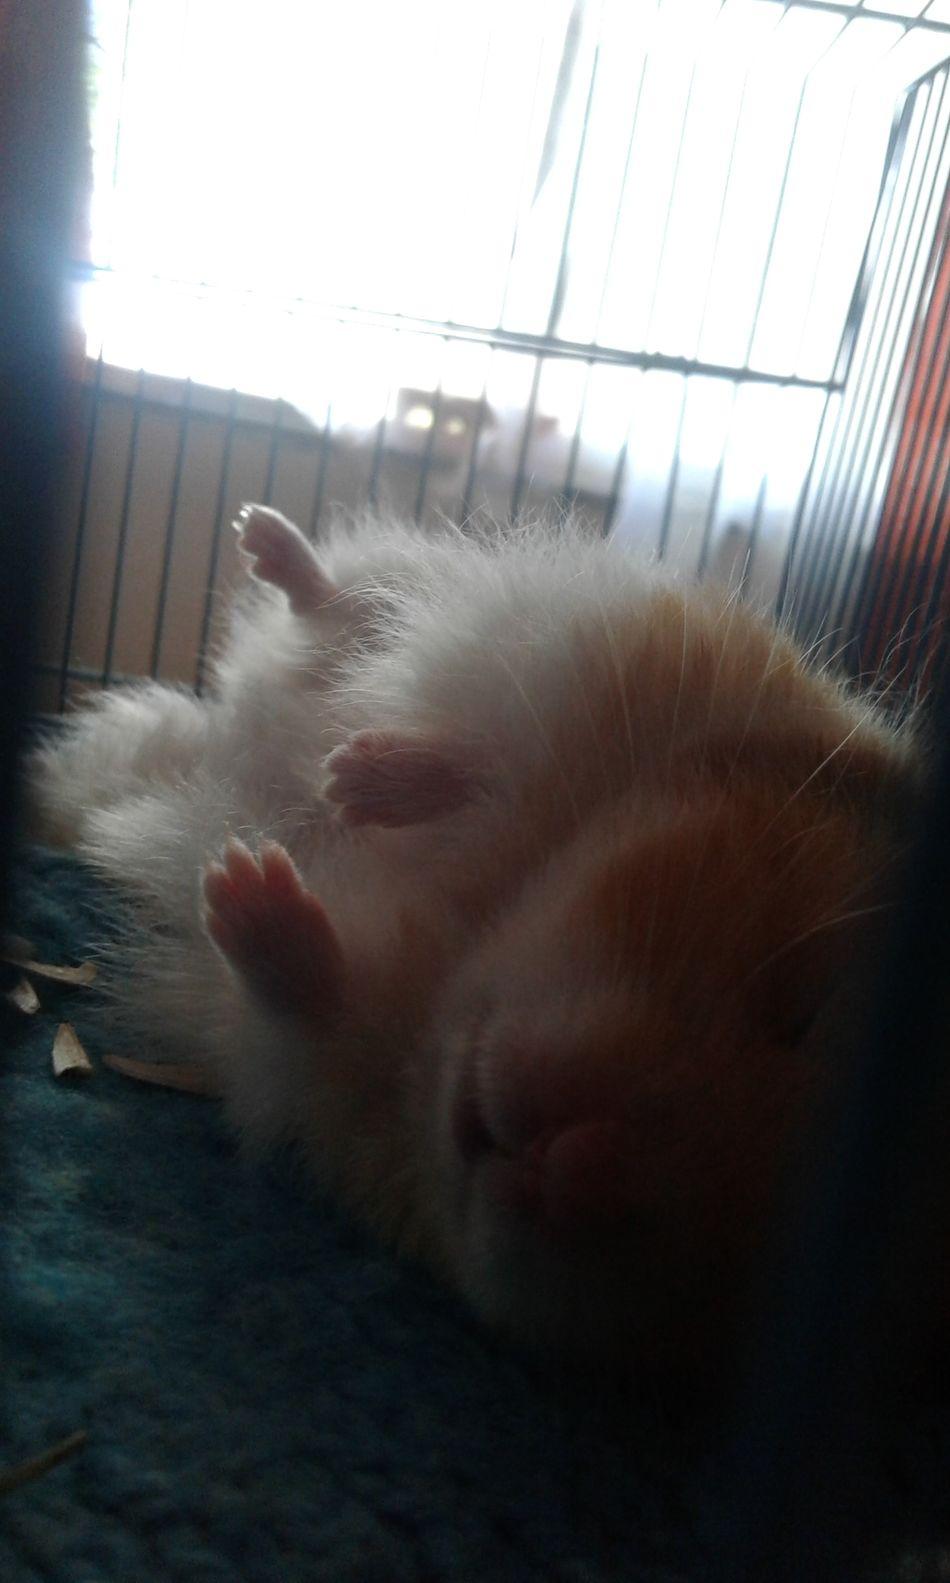 You look so cute my little baby♡ sweet dreams (=^u^=) Hamster Sleep Dreams Cute Sweet Animal Pet Family Sweet Dreams Beautiful Wonderful Without Filters Hermosa Mascota Dormir Dulces Sueños